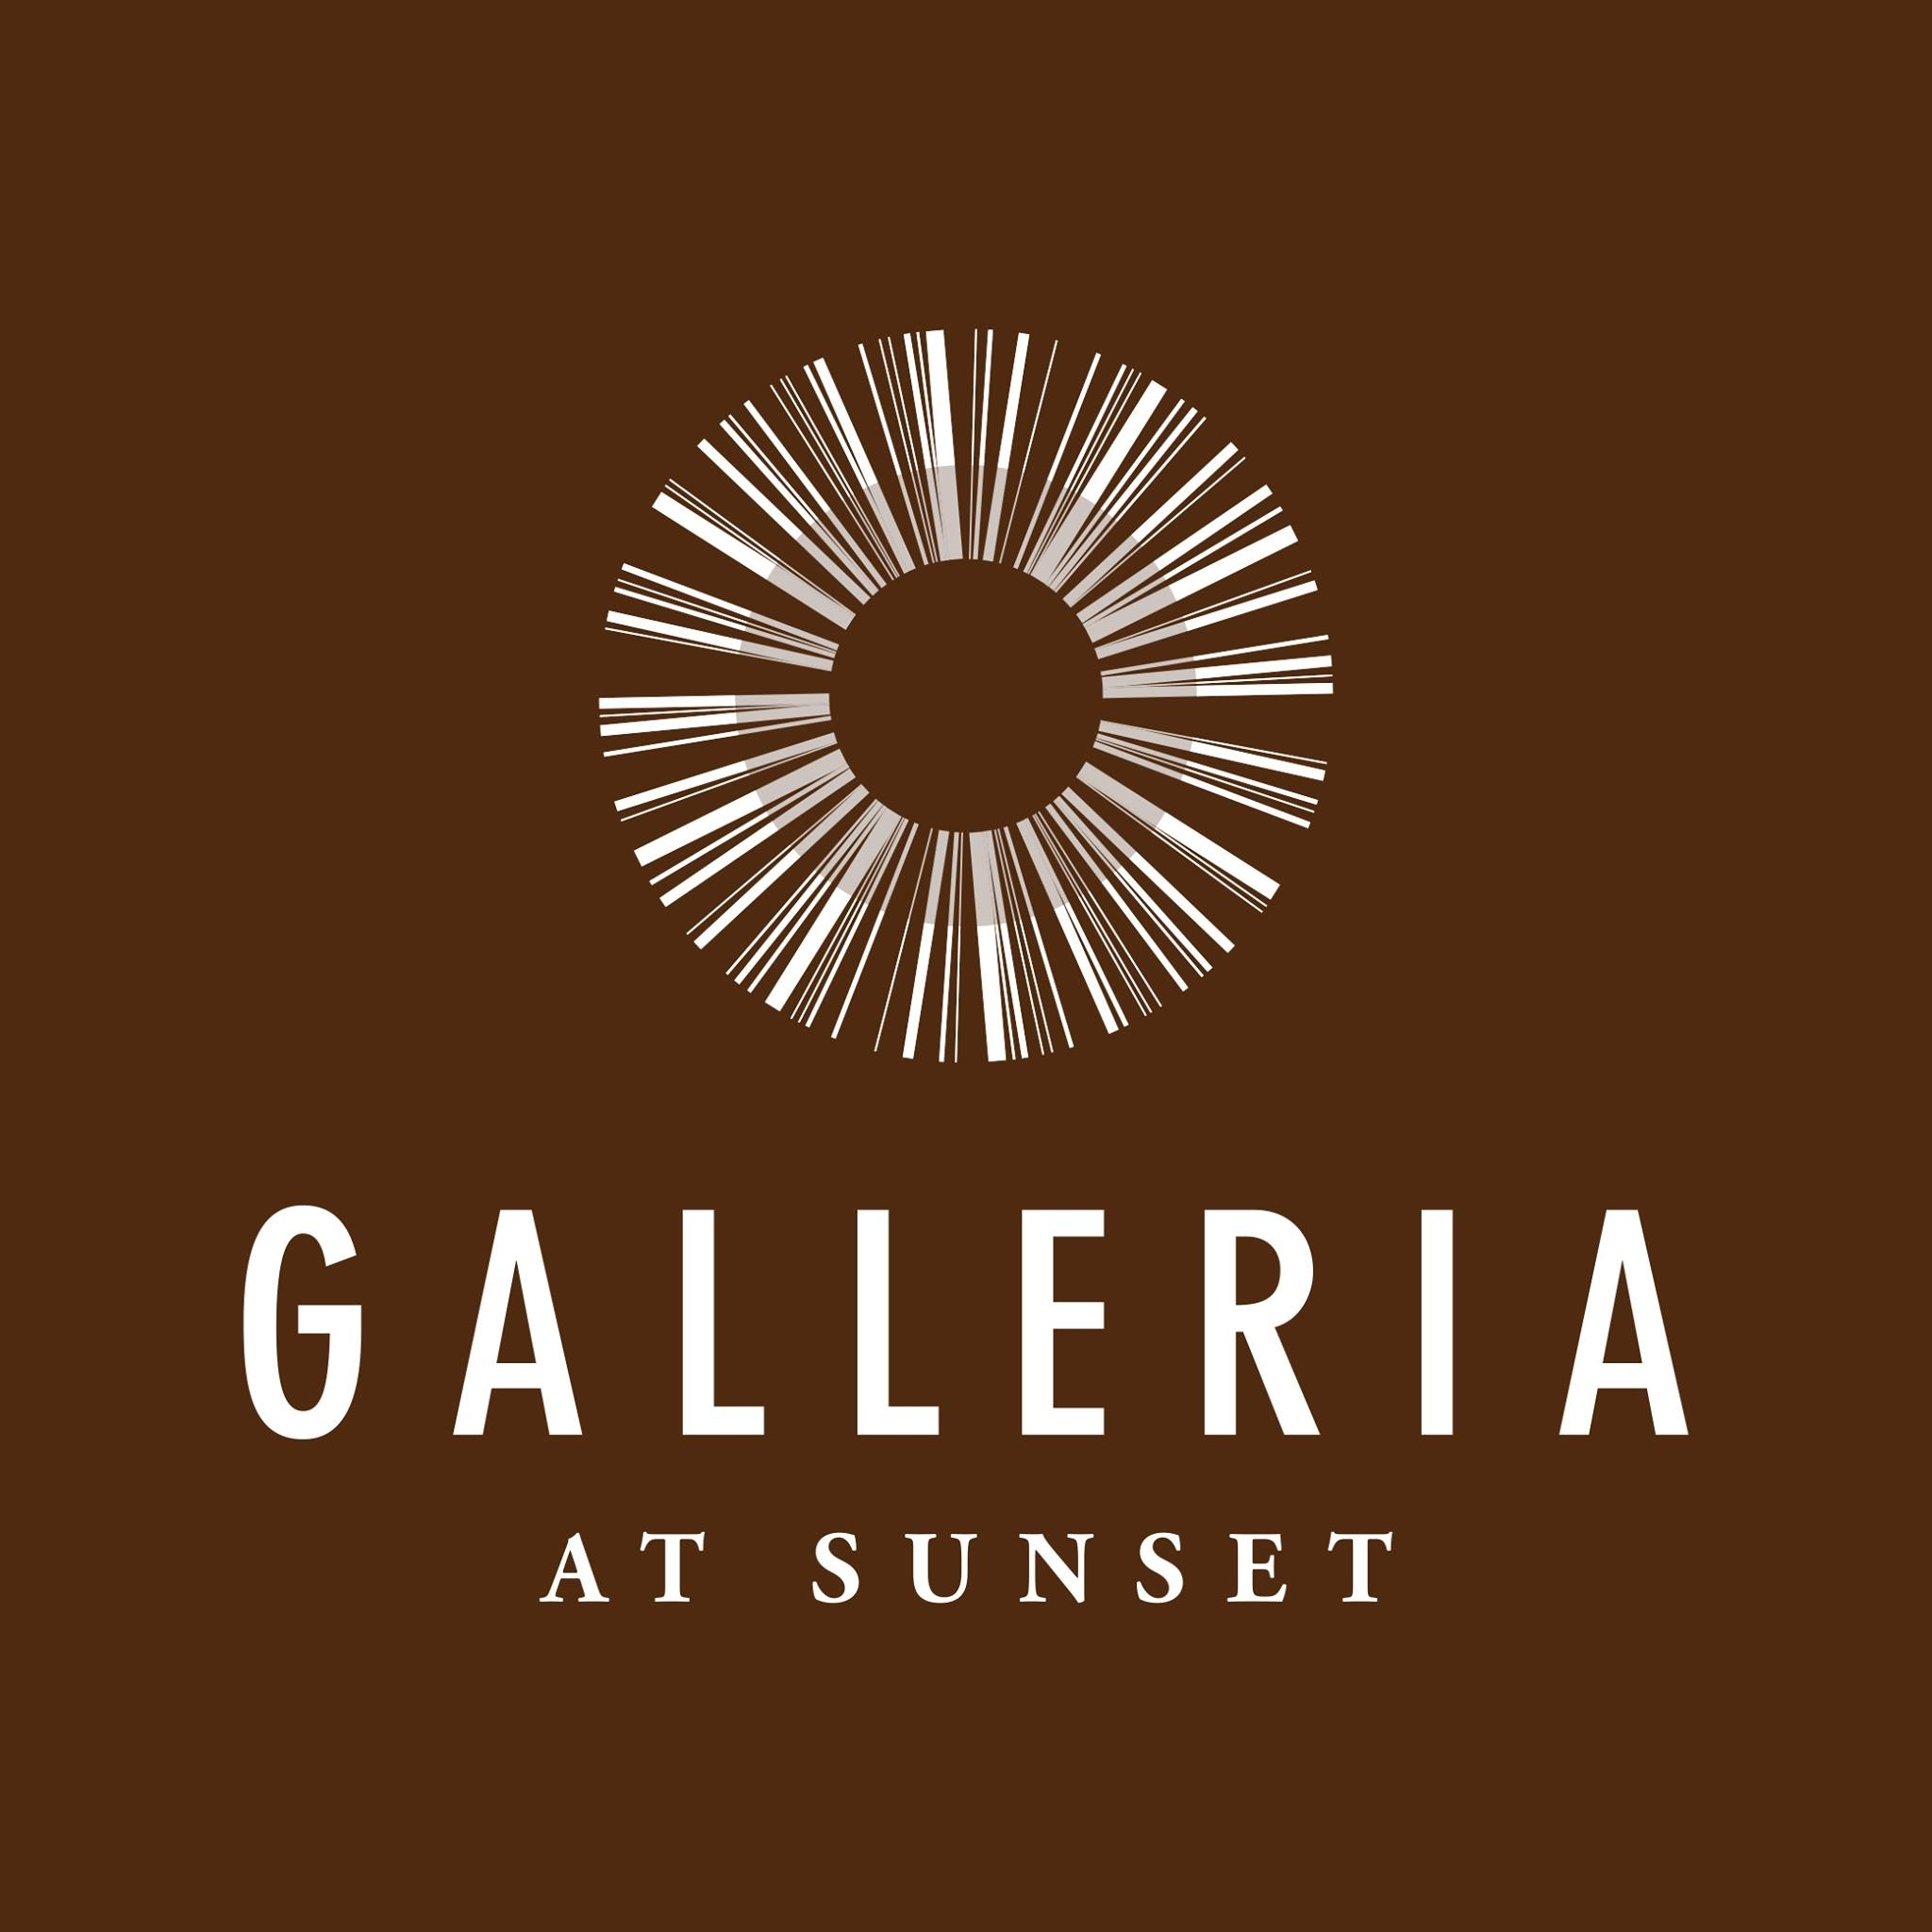 Dillards Furniture Austin: Galleria At Sunset